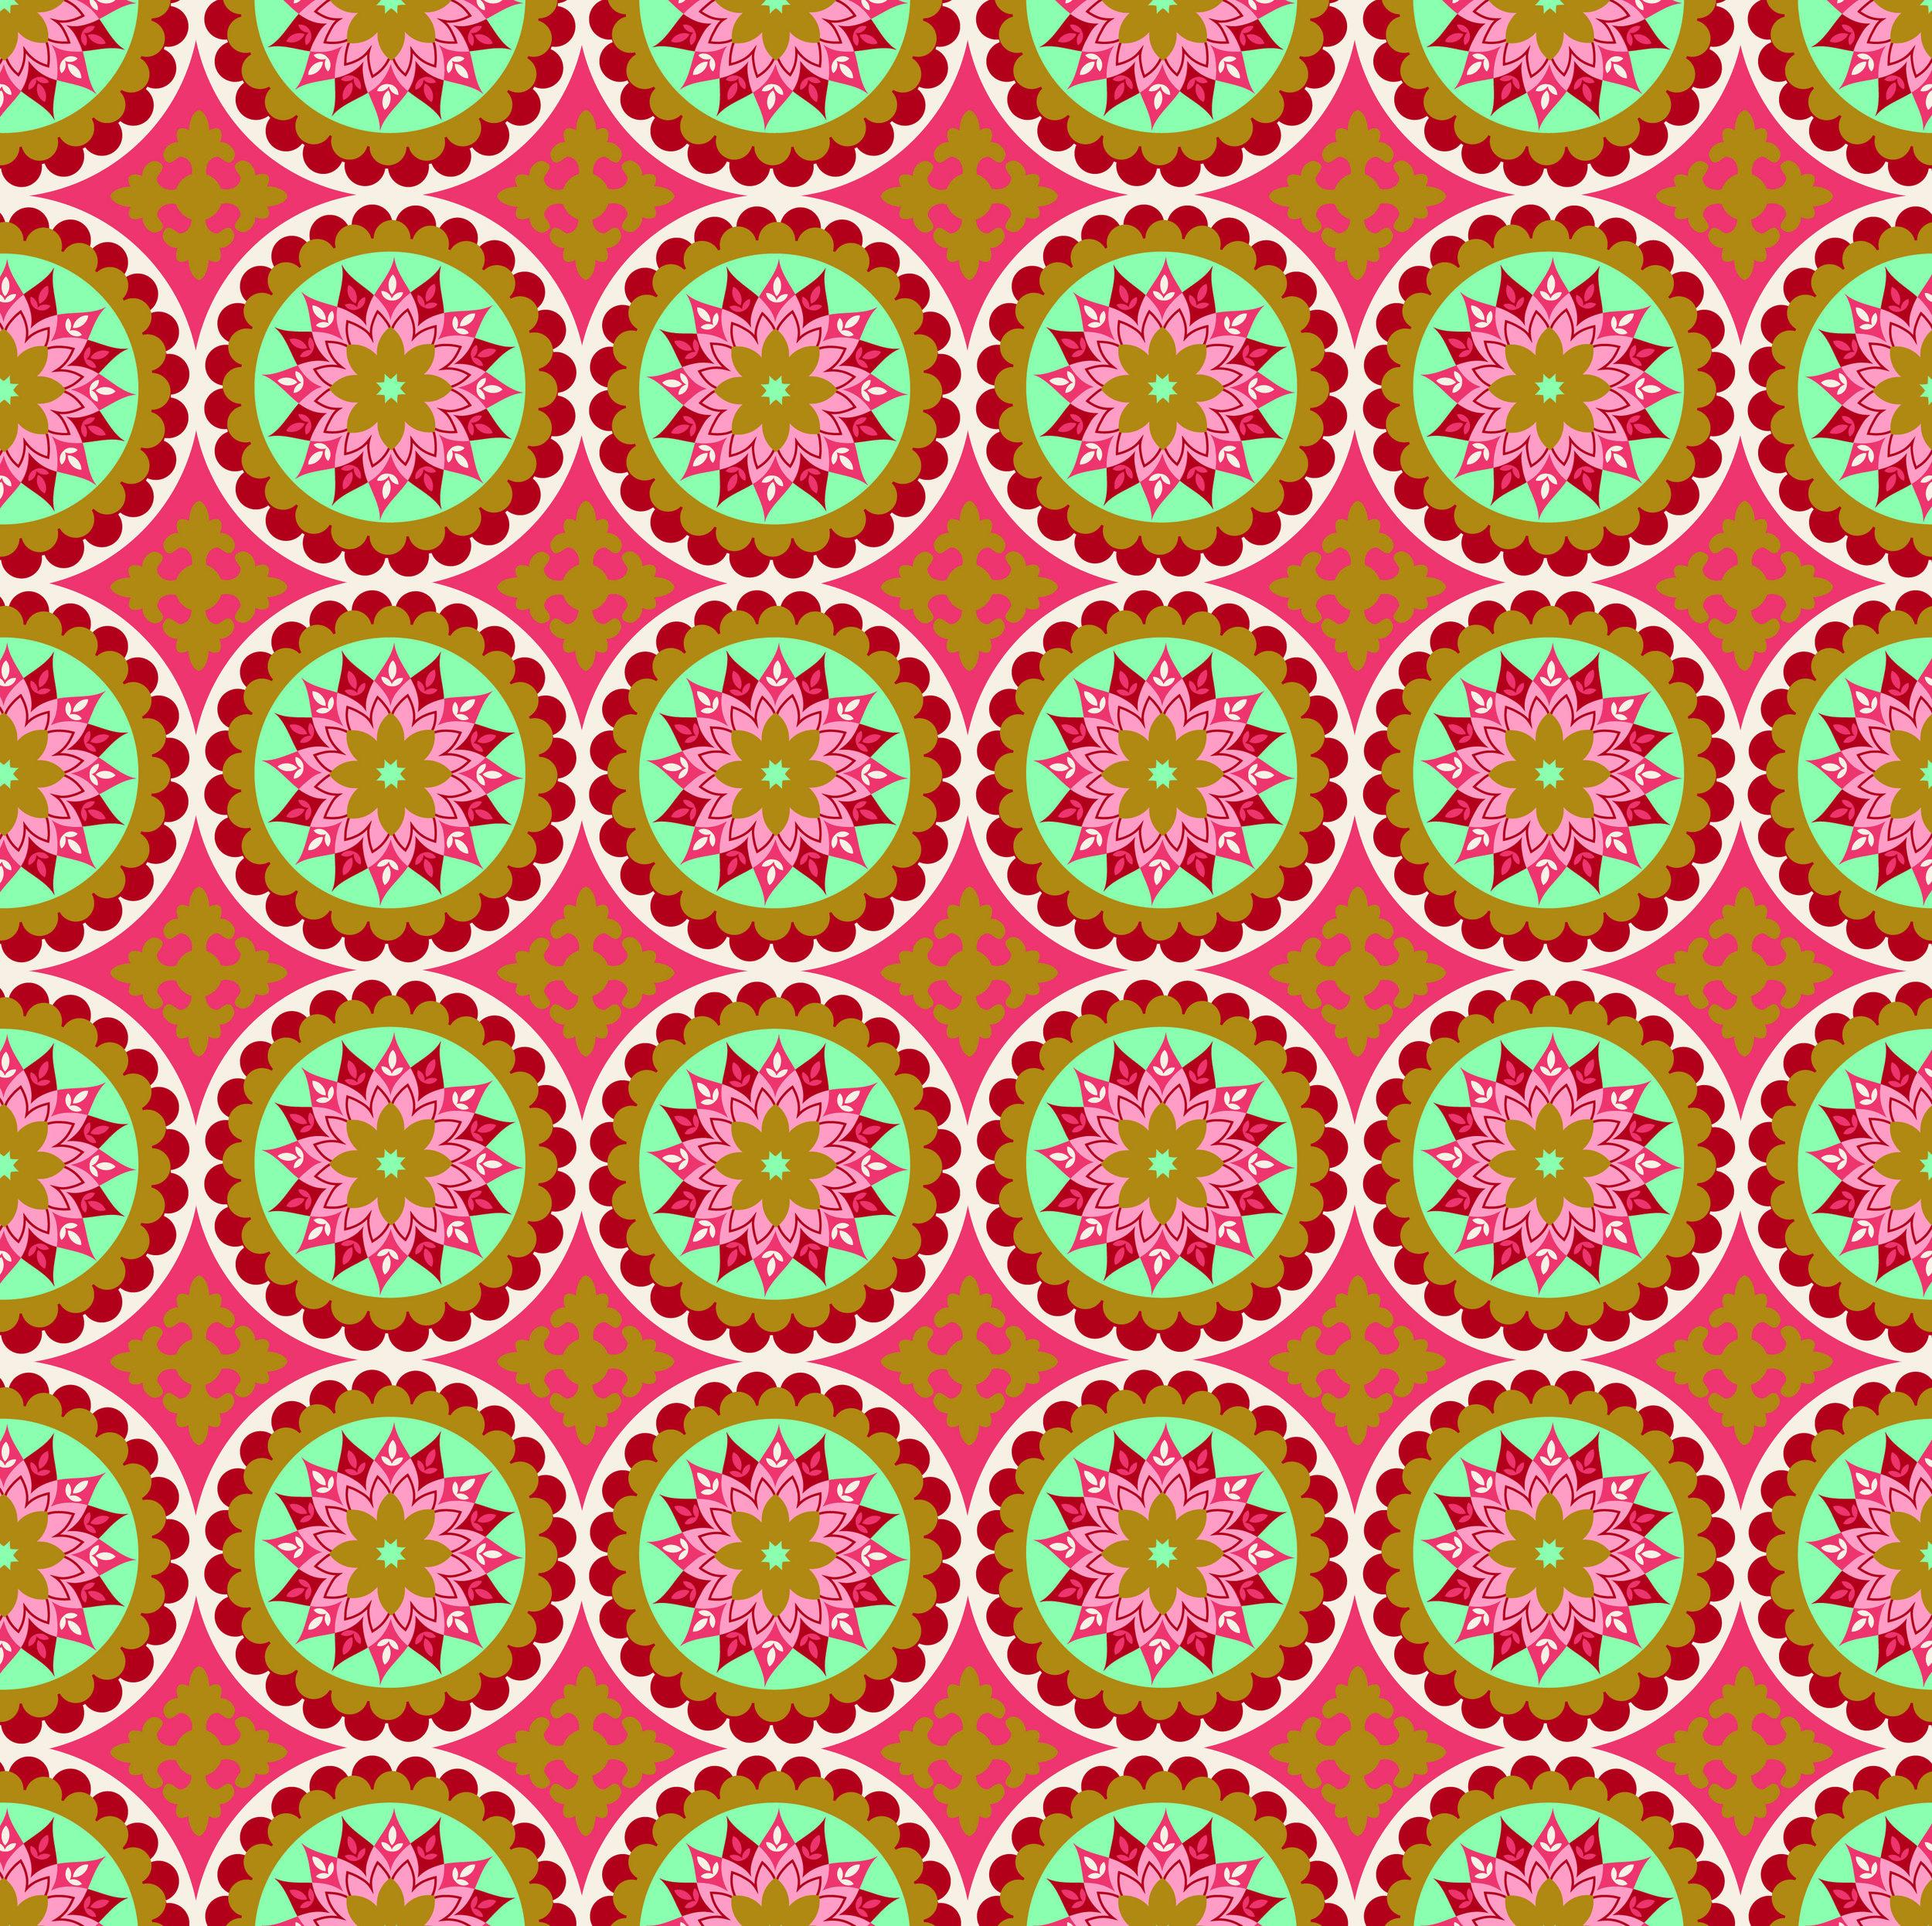 C4742-RED_LaVieBoheme_Medallion_300dpi.jpg